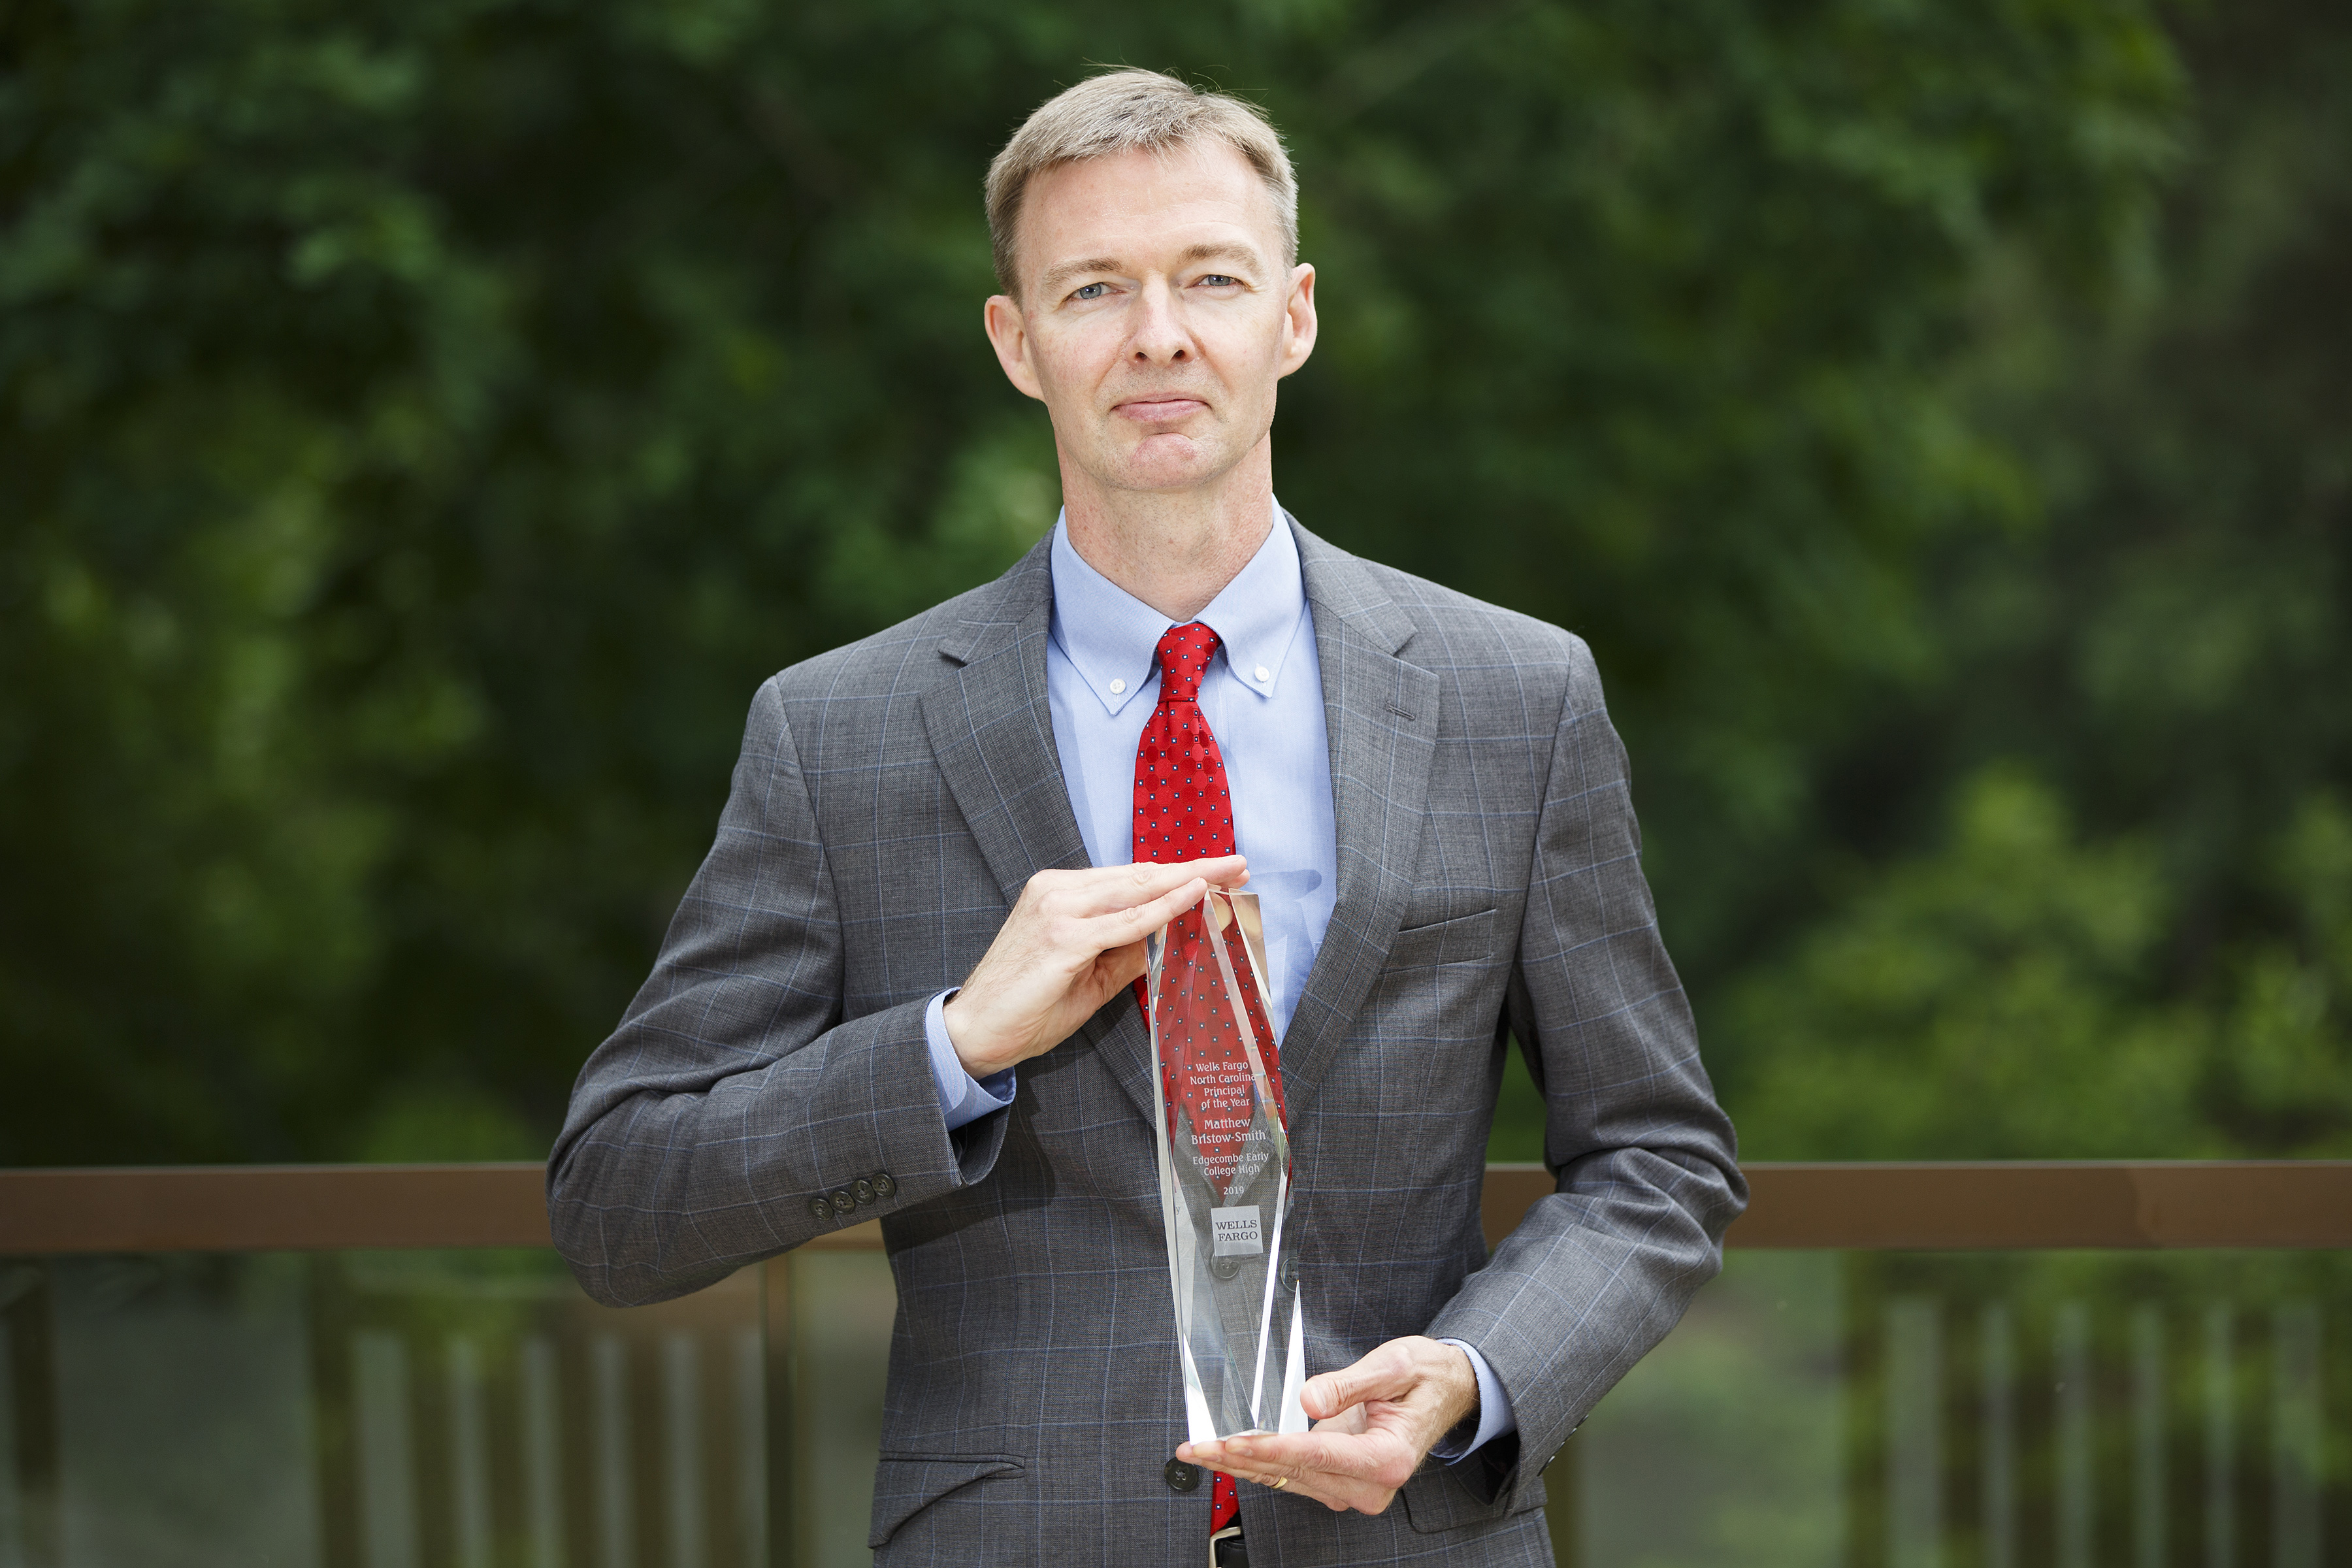 2019 Principal of the Year Winner, Matthew Bristow-Smith